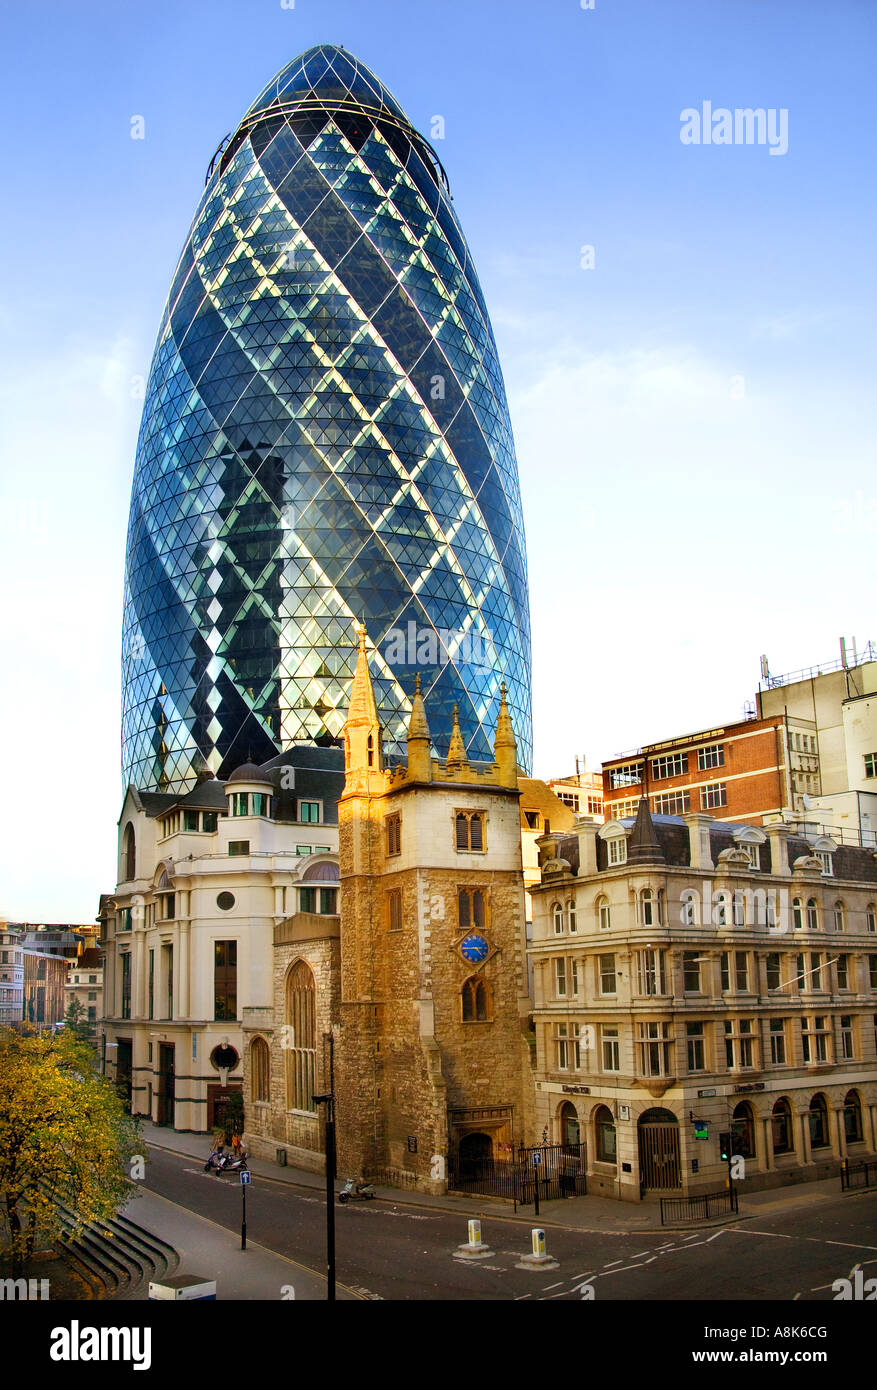 Glas moderne b ro geb ude von the gherkin towering ber for Modernes buro